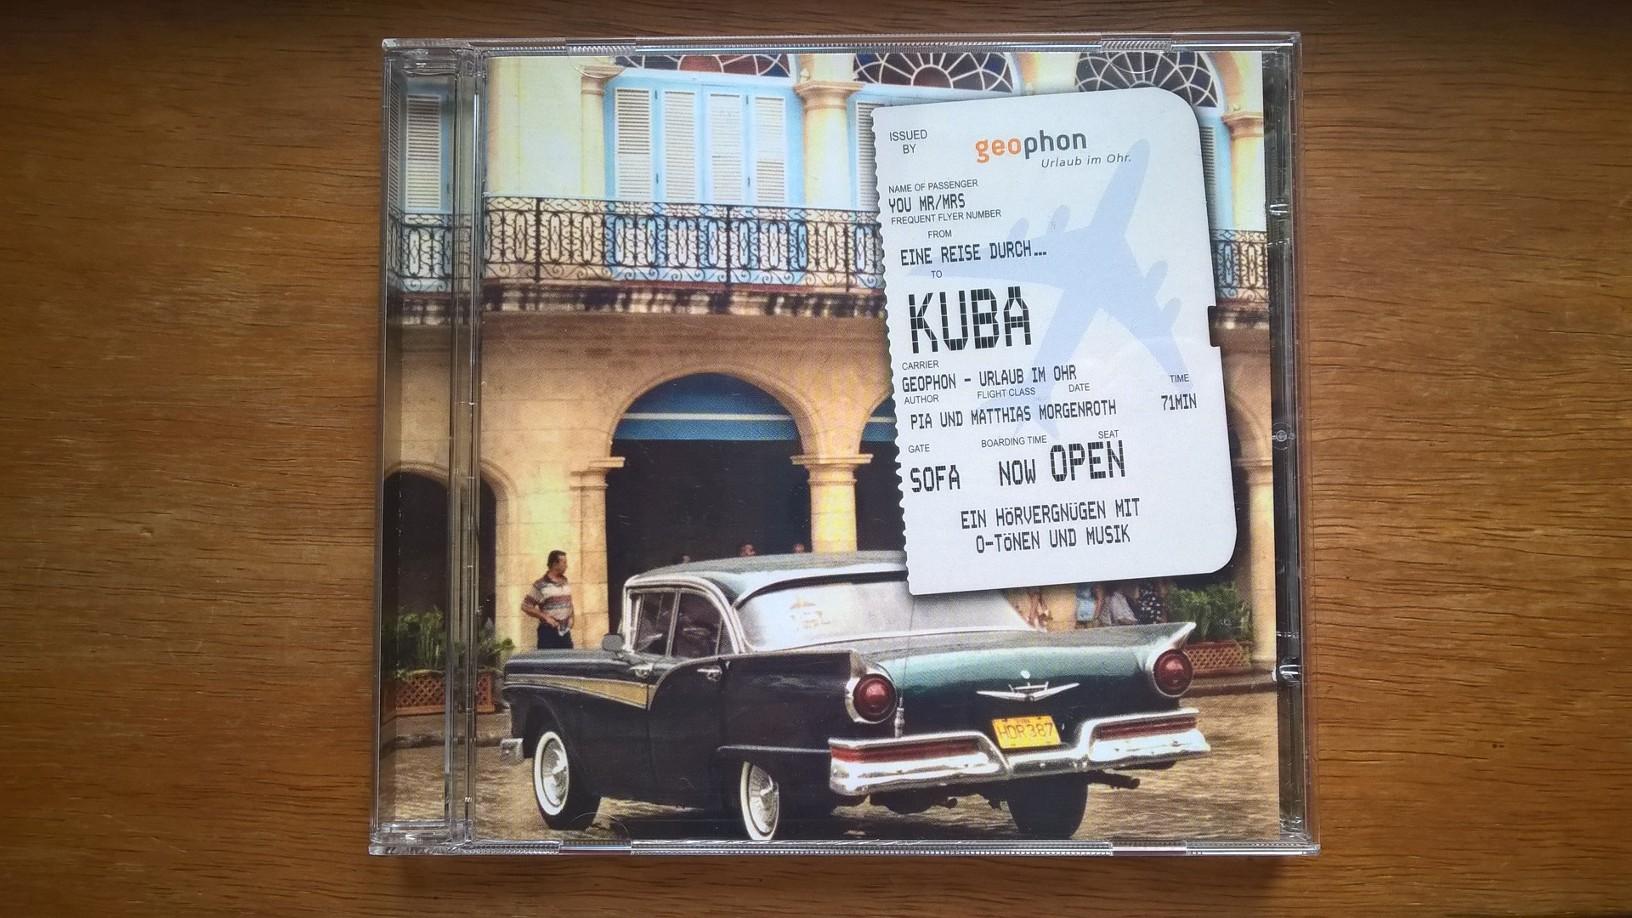 Foto vom CD-Cover